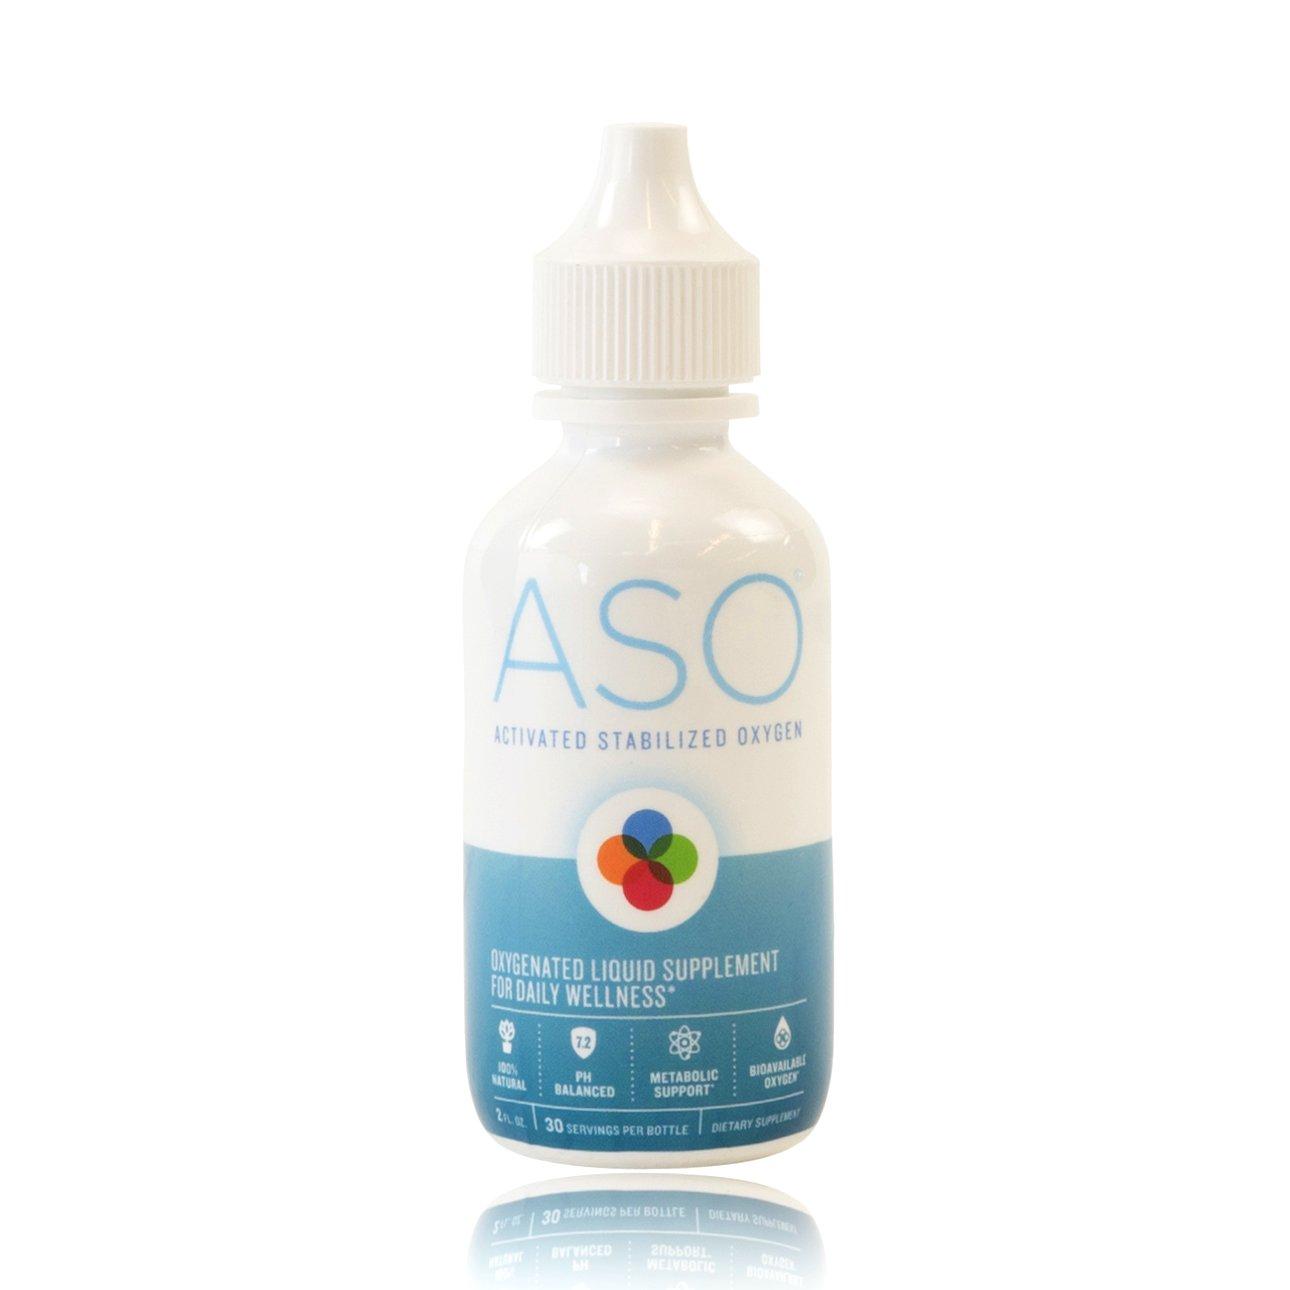 ASO 35% 350,000ppm ACTIVATED STABILIZED LIQUID OXYGEN 2 OZ Bio-Available Oxygen-Enhanced Formula